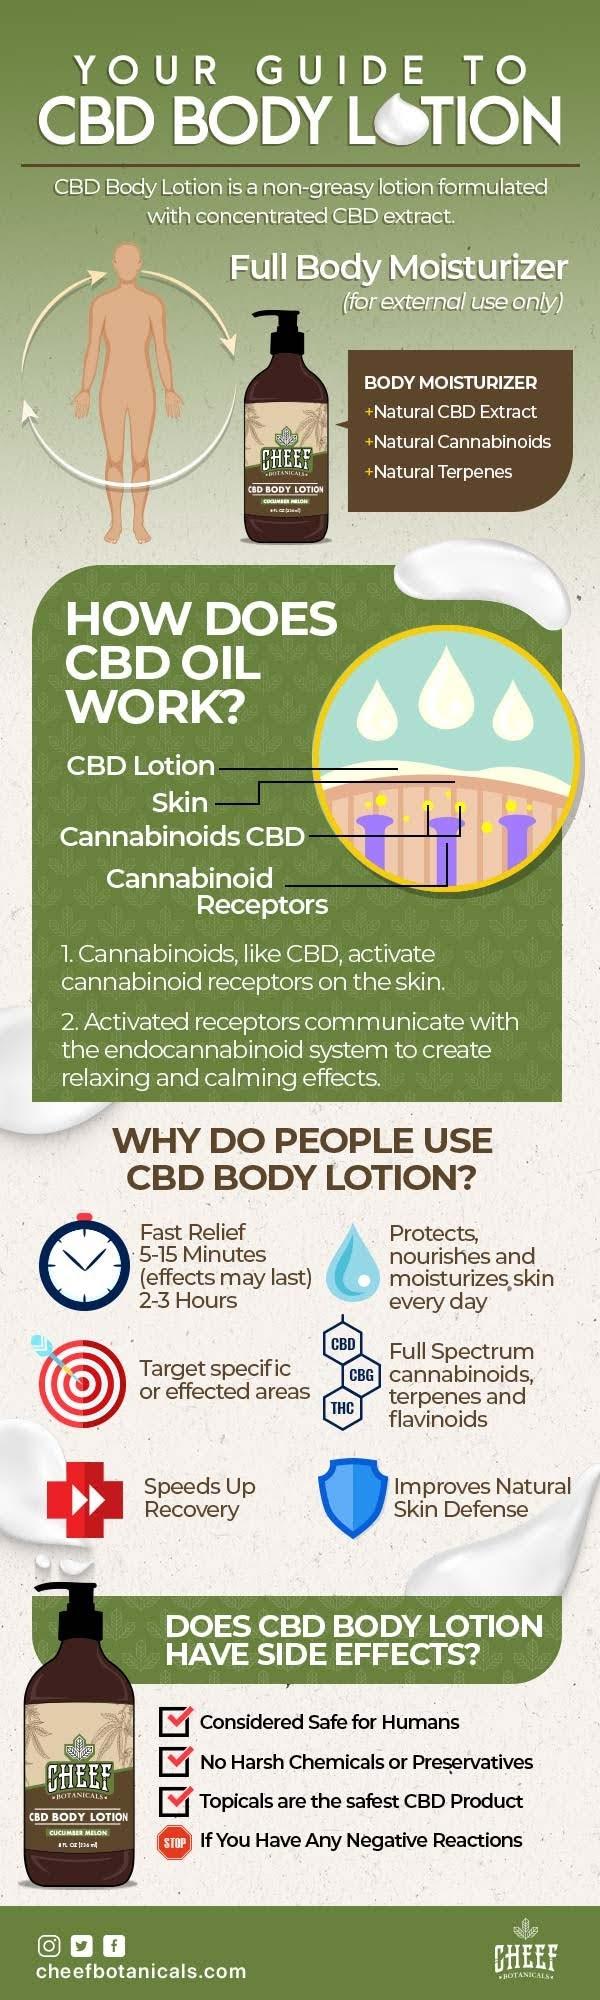 cbd-body-lotion-infographic